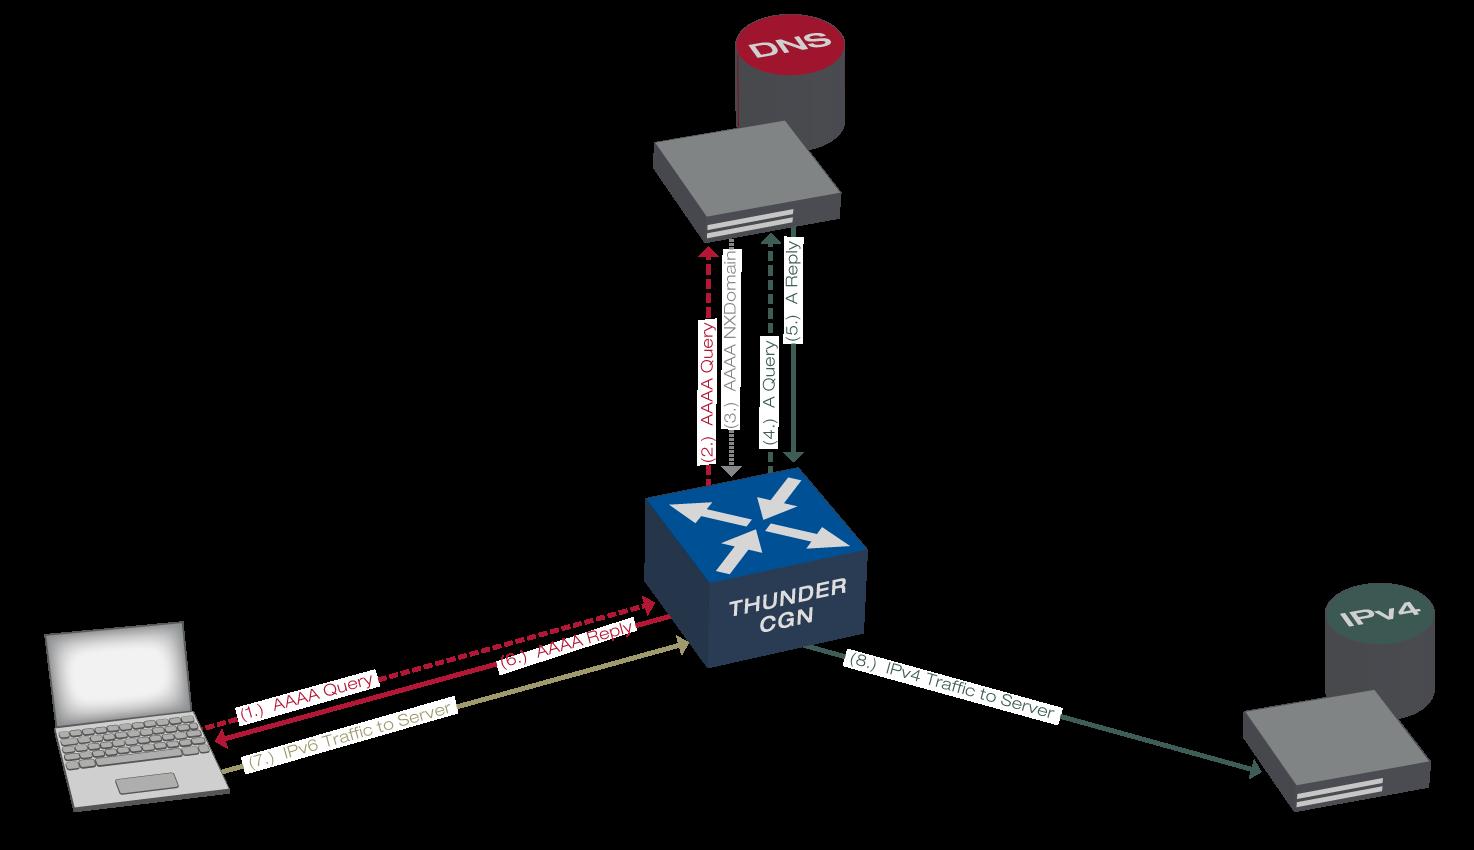 NAT20 und DNS20 auf A20 Networks Thunder CGN   Xantaro